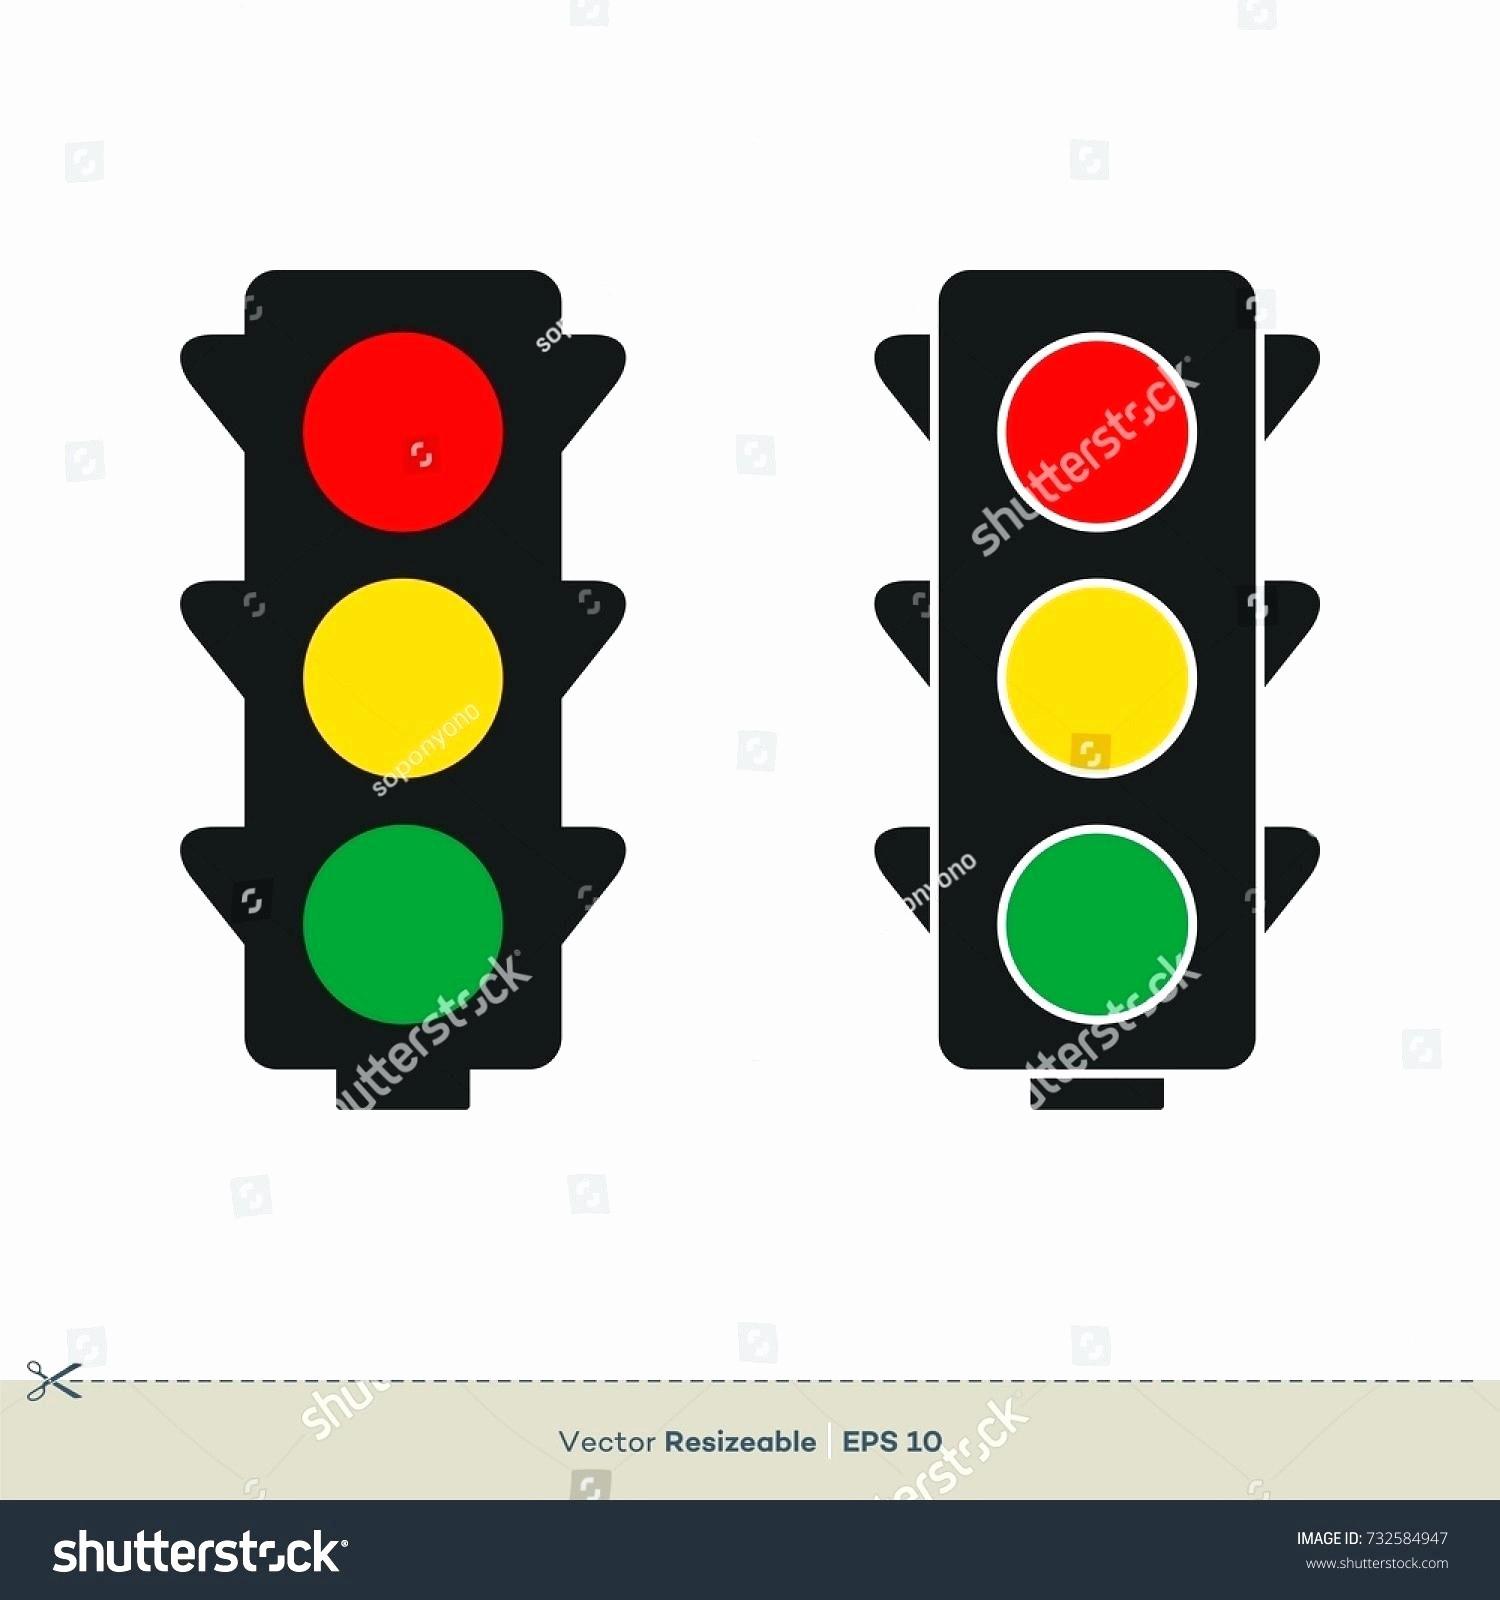 Stop Sign Template Microsoft Word Inspirational Template Traffic Light Template